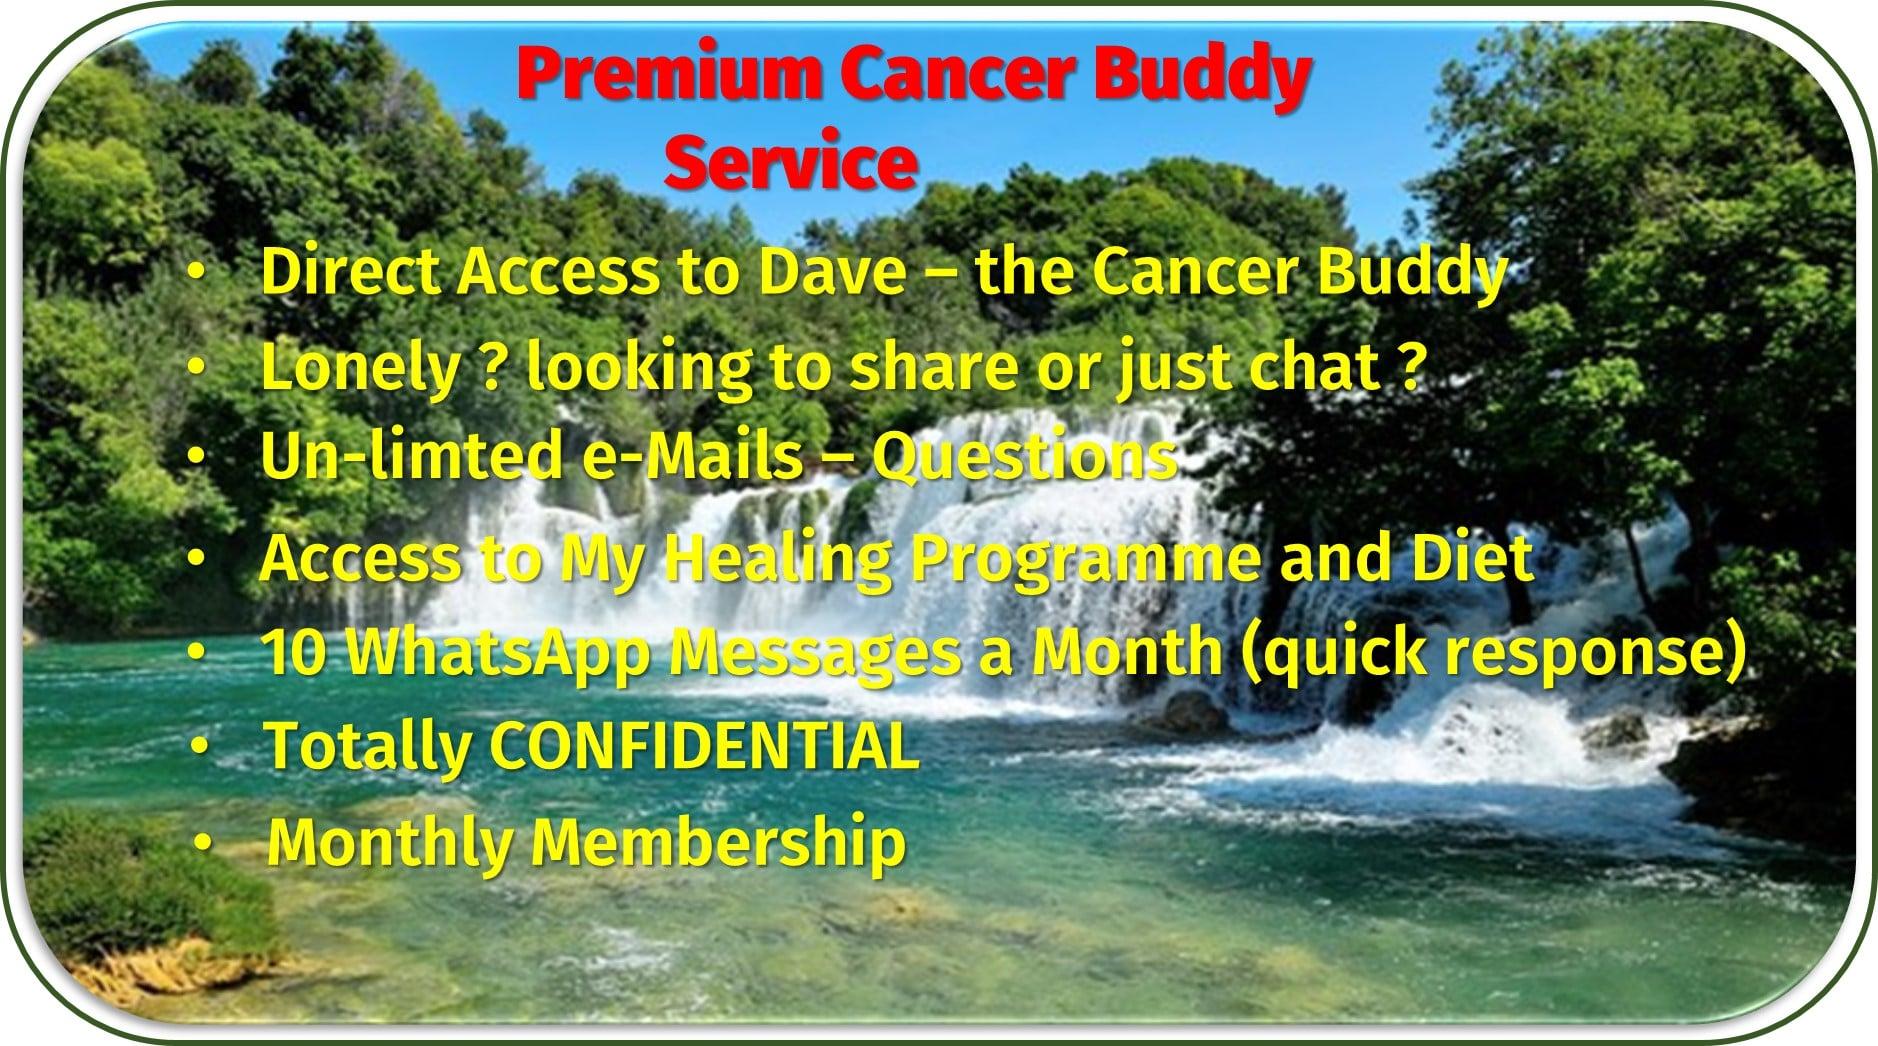 Premium Cancerbuddy Service